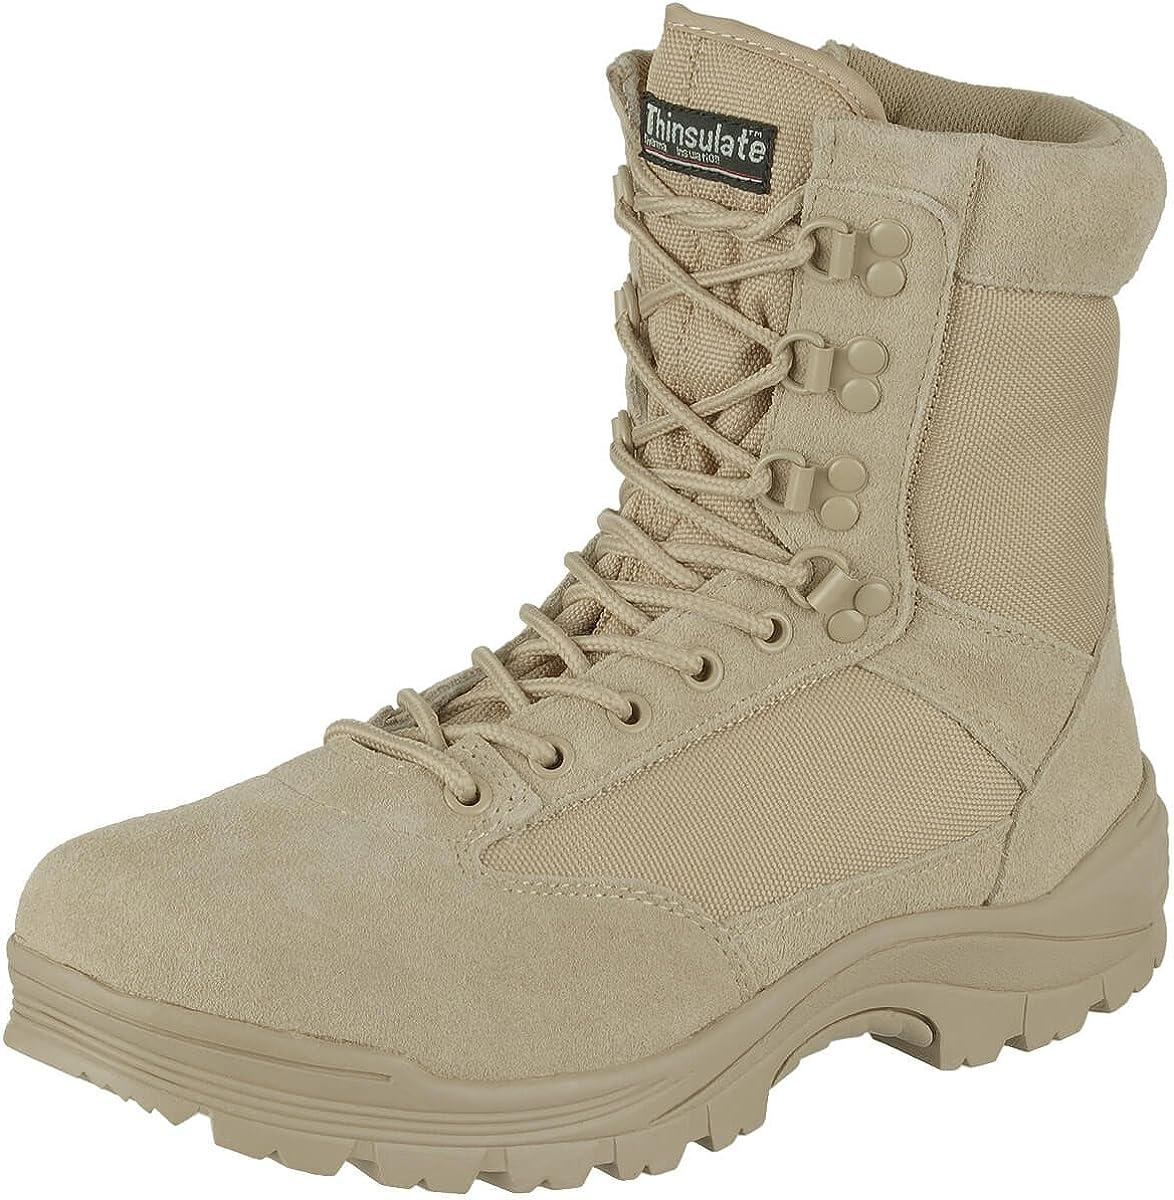 Mil-Tec Tactical Side Zip Boots Khaki Size 11 US